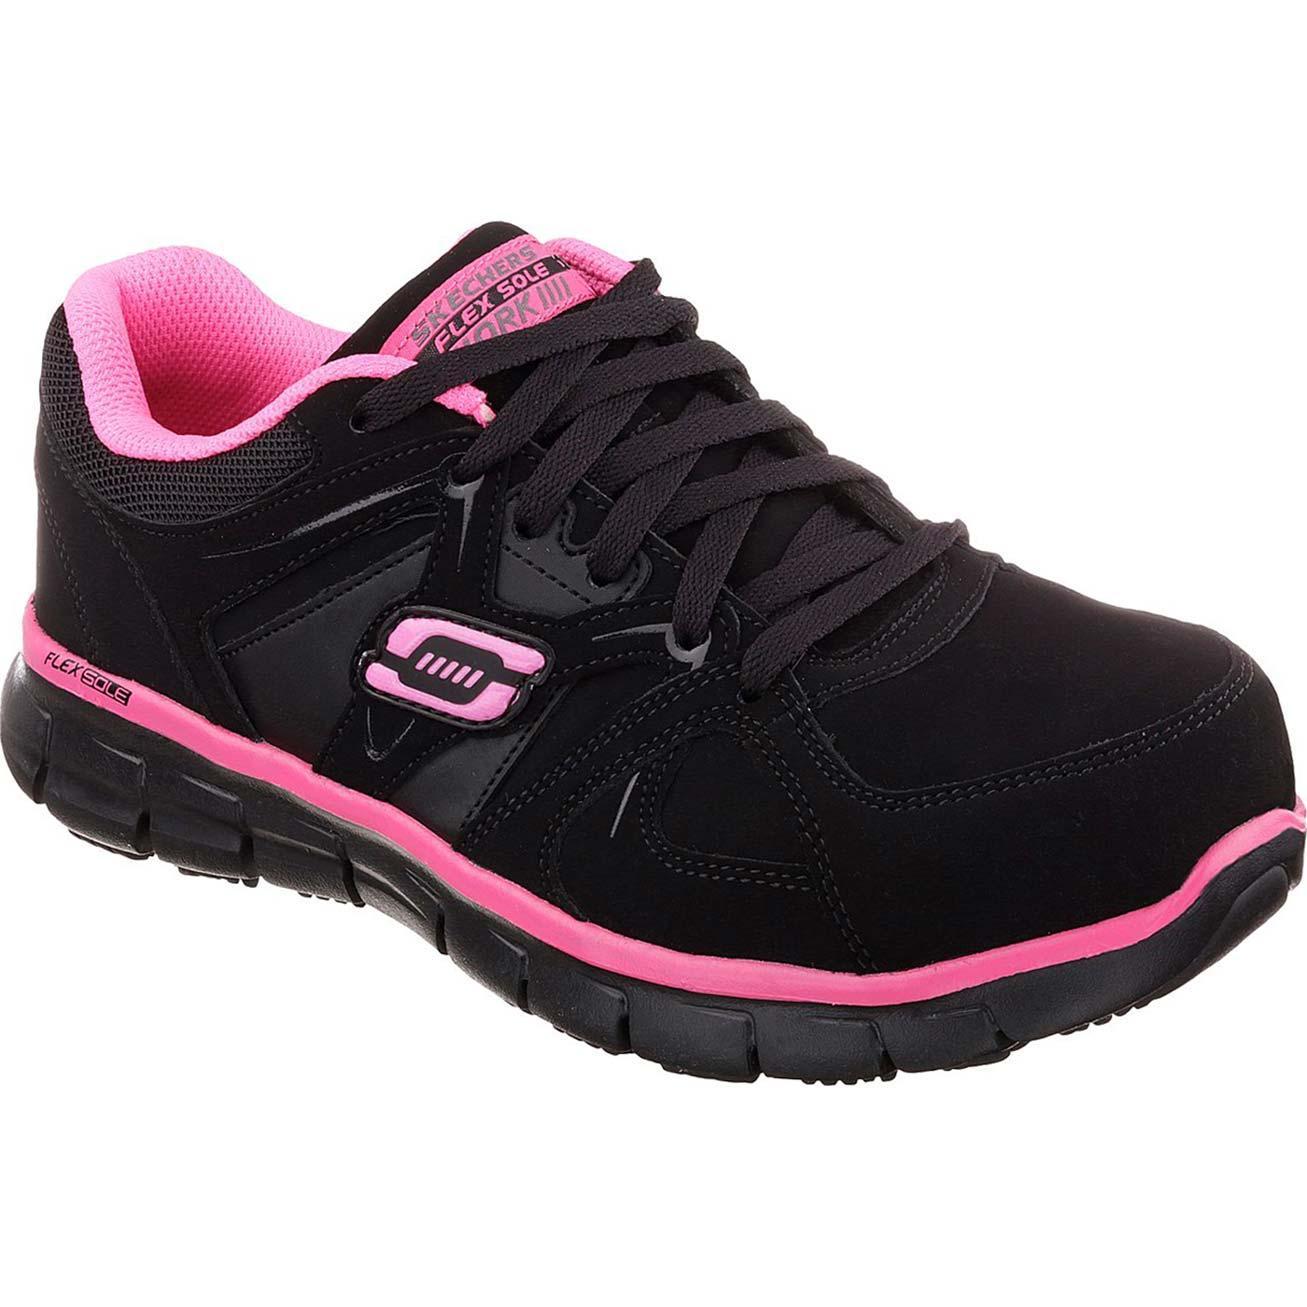 Synergy - Sandlot St- Black/Pink lace-ups